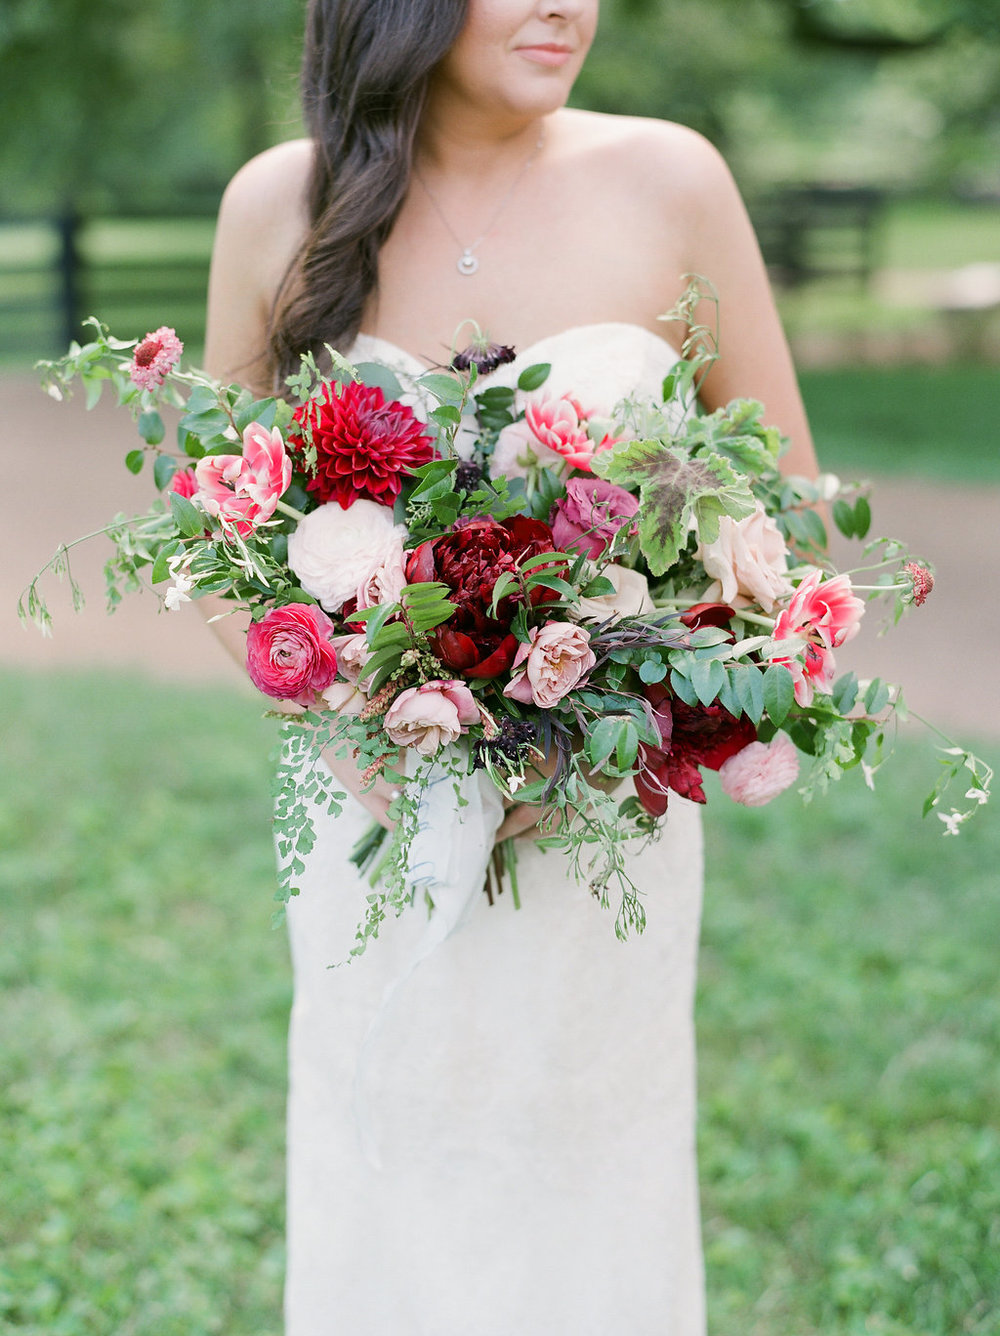 Lush bridal bouquet with marsala dahlias, pink tulips, burgundy peonies, pink ranunculus, and maidenhair fern // Nashville Wedding Floral Design